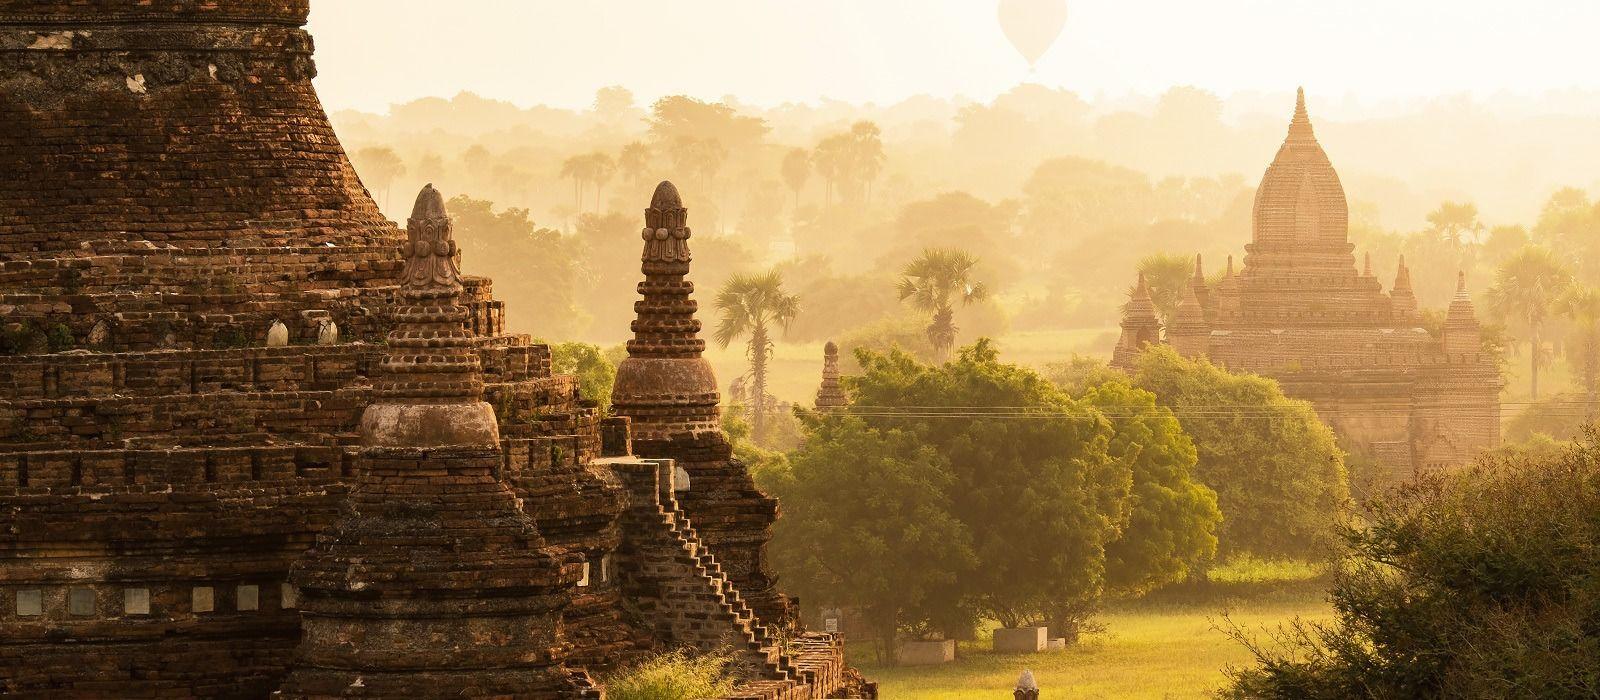 Myanmar for Beginners Tour Trip 2